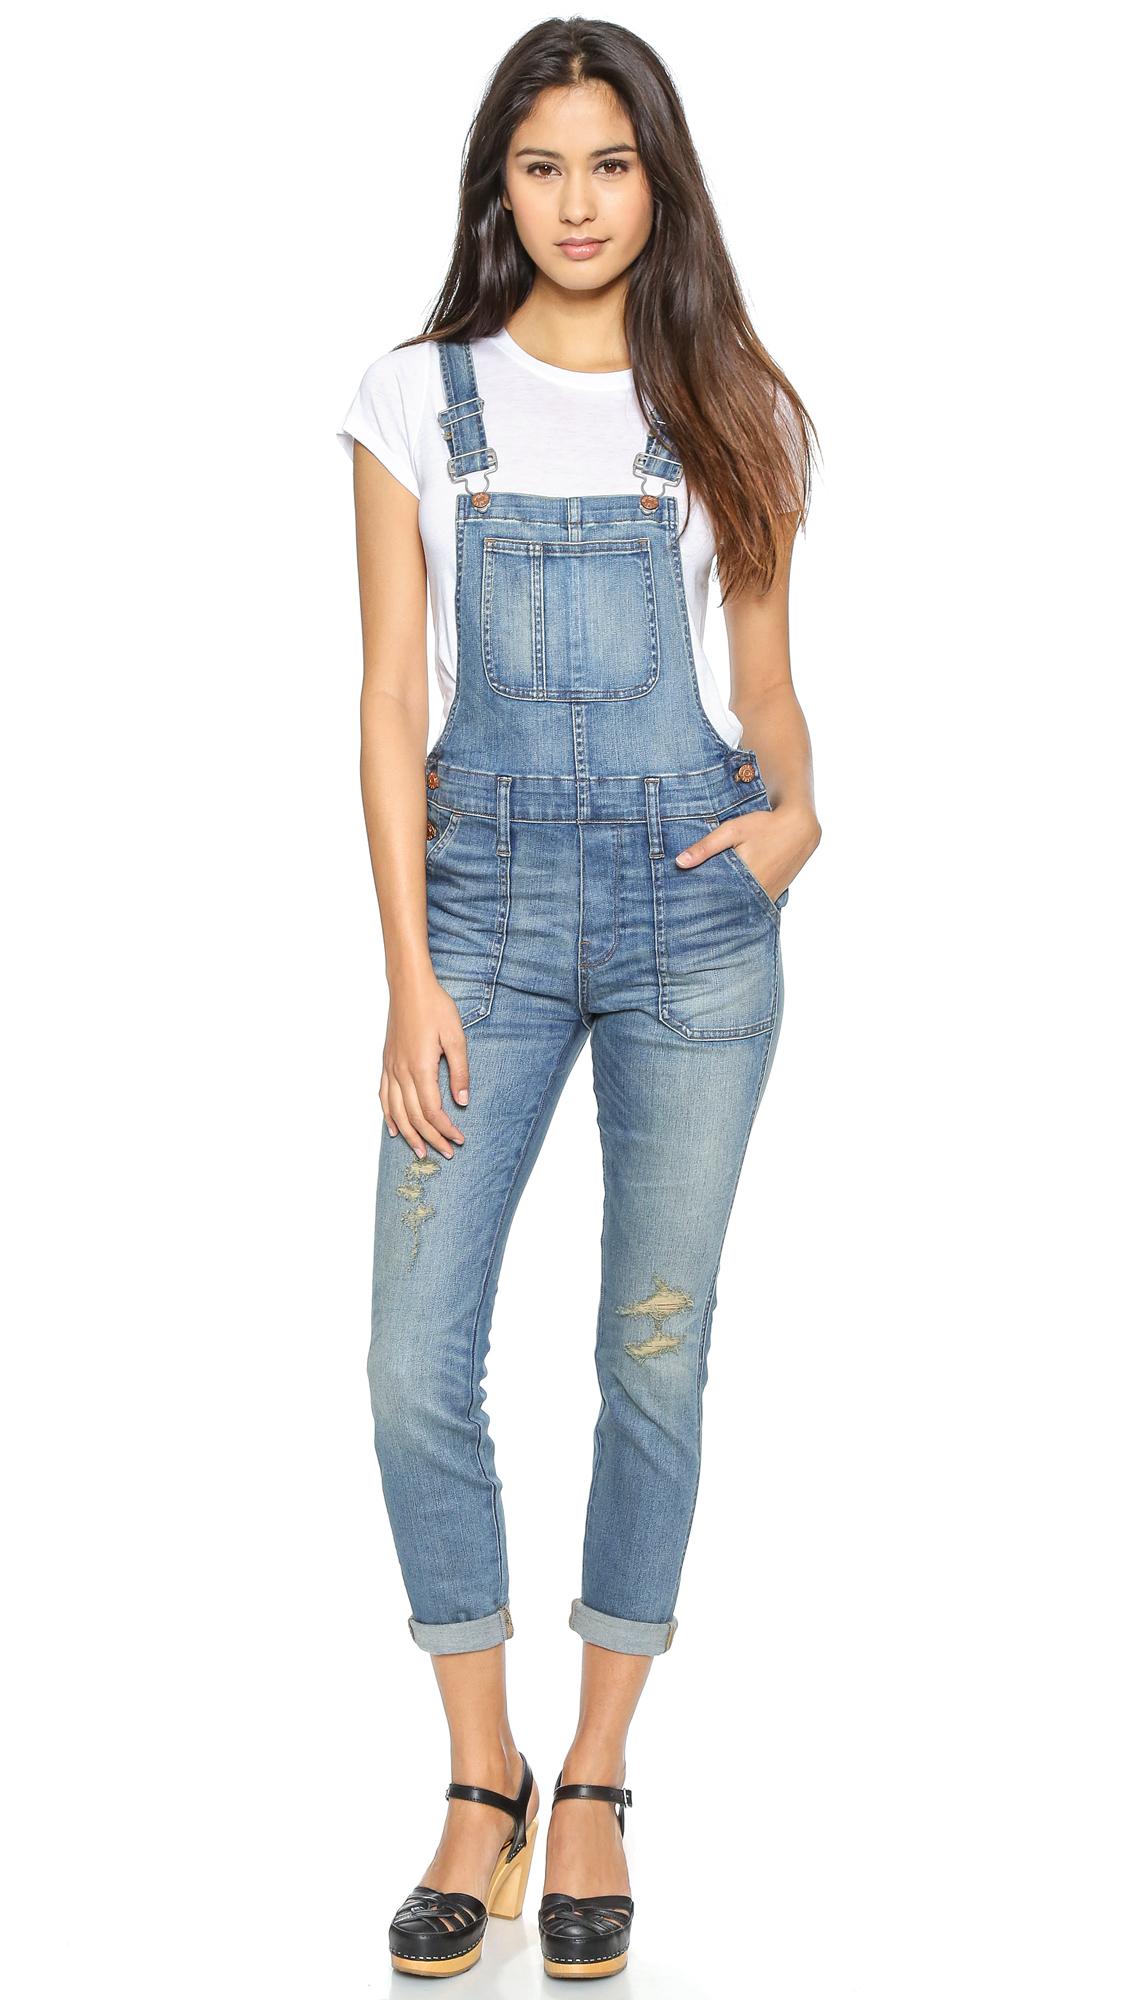 91793b29b4 Skinny Jeans Overalls